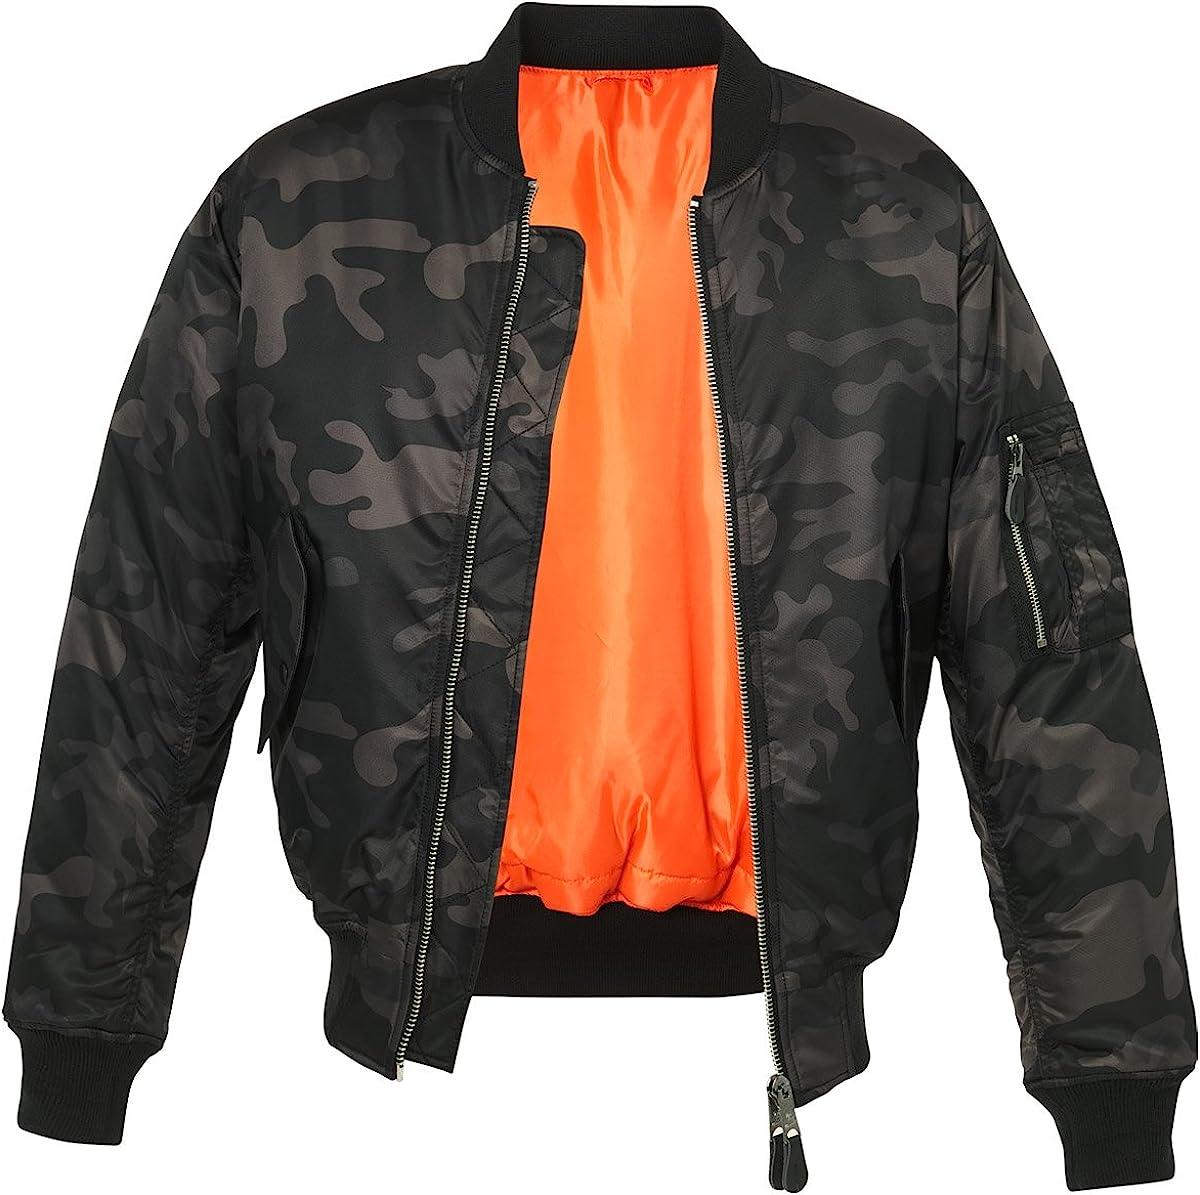 Brandit Men's MA1 Dark 迅速な対応で商品をお届け致します Jacket 新作通販 Camo